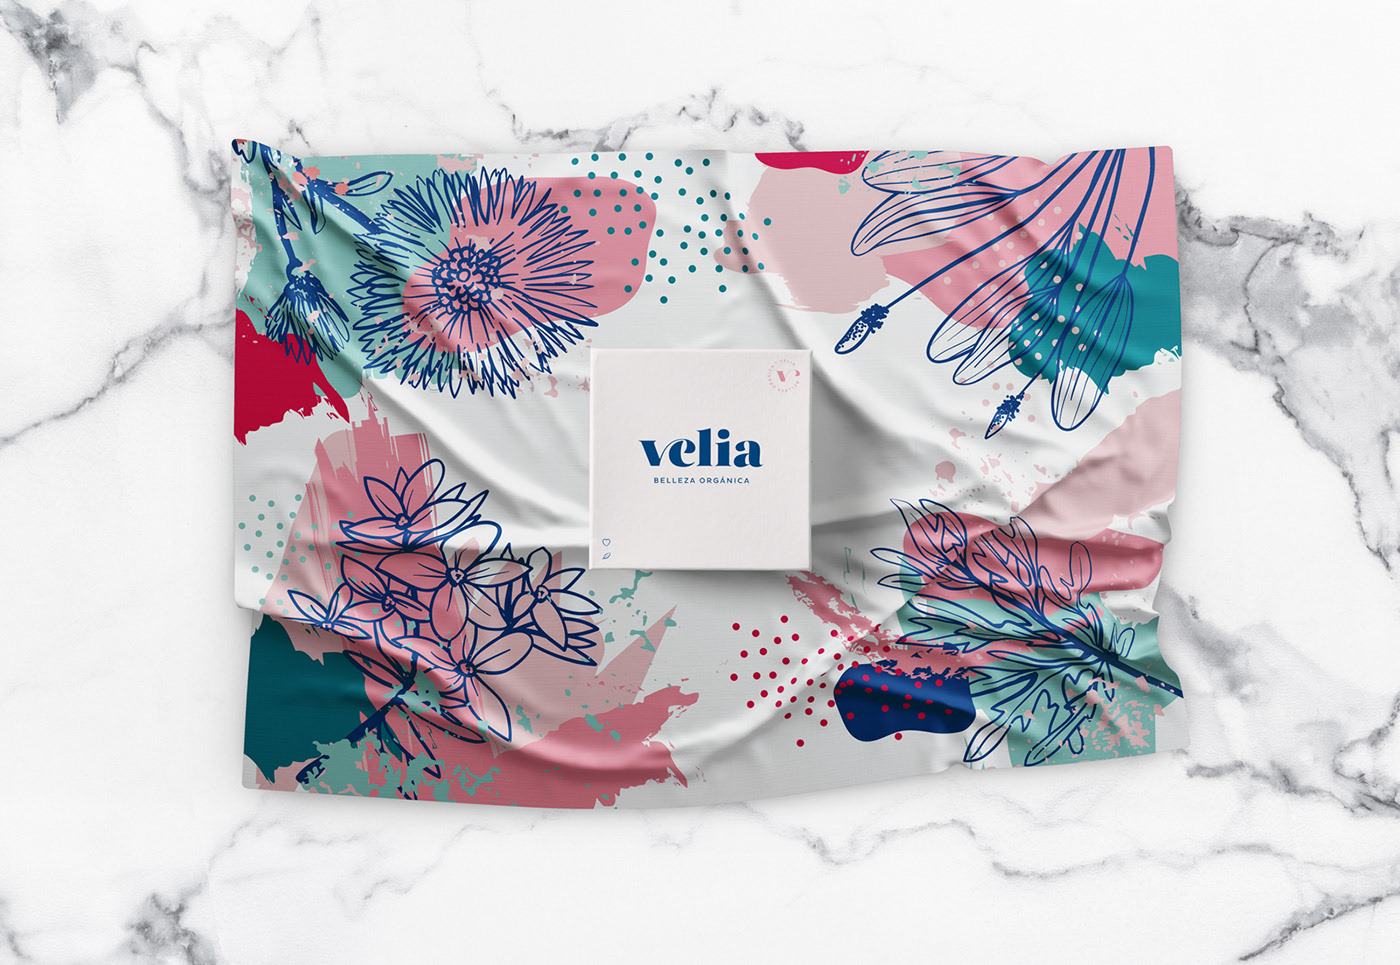 Velia, Belleza Orgánica by Volumínica - Creative Work